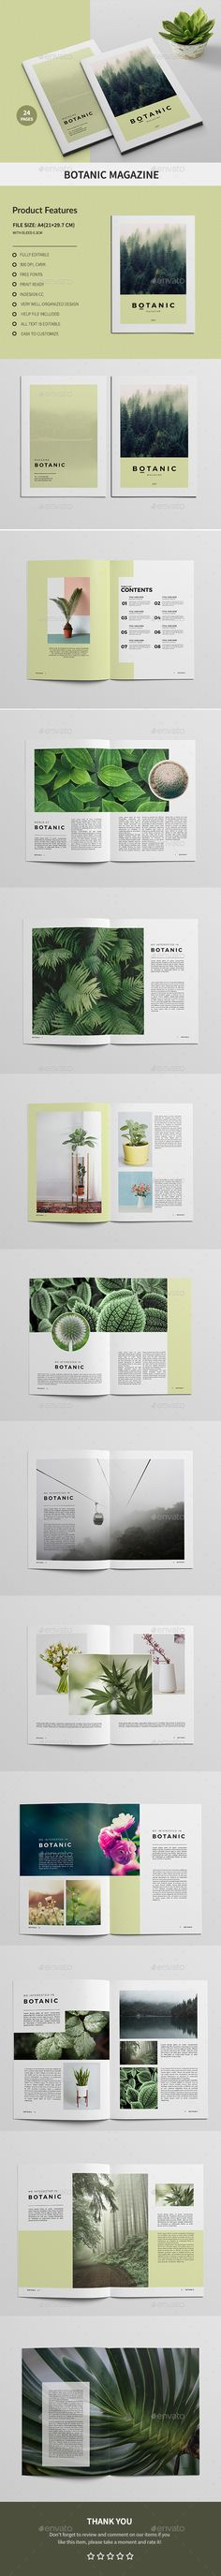 Botanic Magazine - Magazines Print Templates Download here : https://graphicriver.net/item/botanic-magazine/19956161?s_rank=23&ref=Al-fatih #magazine #magazine template #magazine layout #template #premium design #design grafis #layout #creative design #indesign magazine